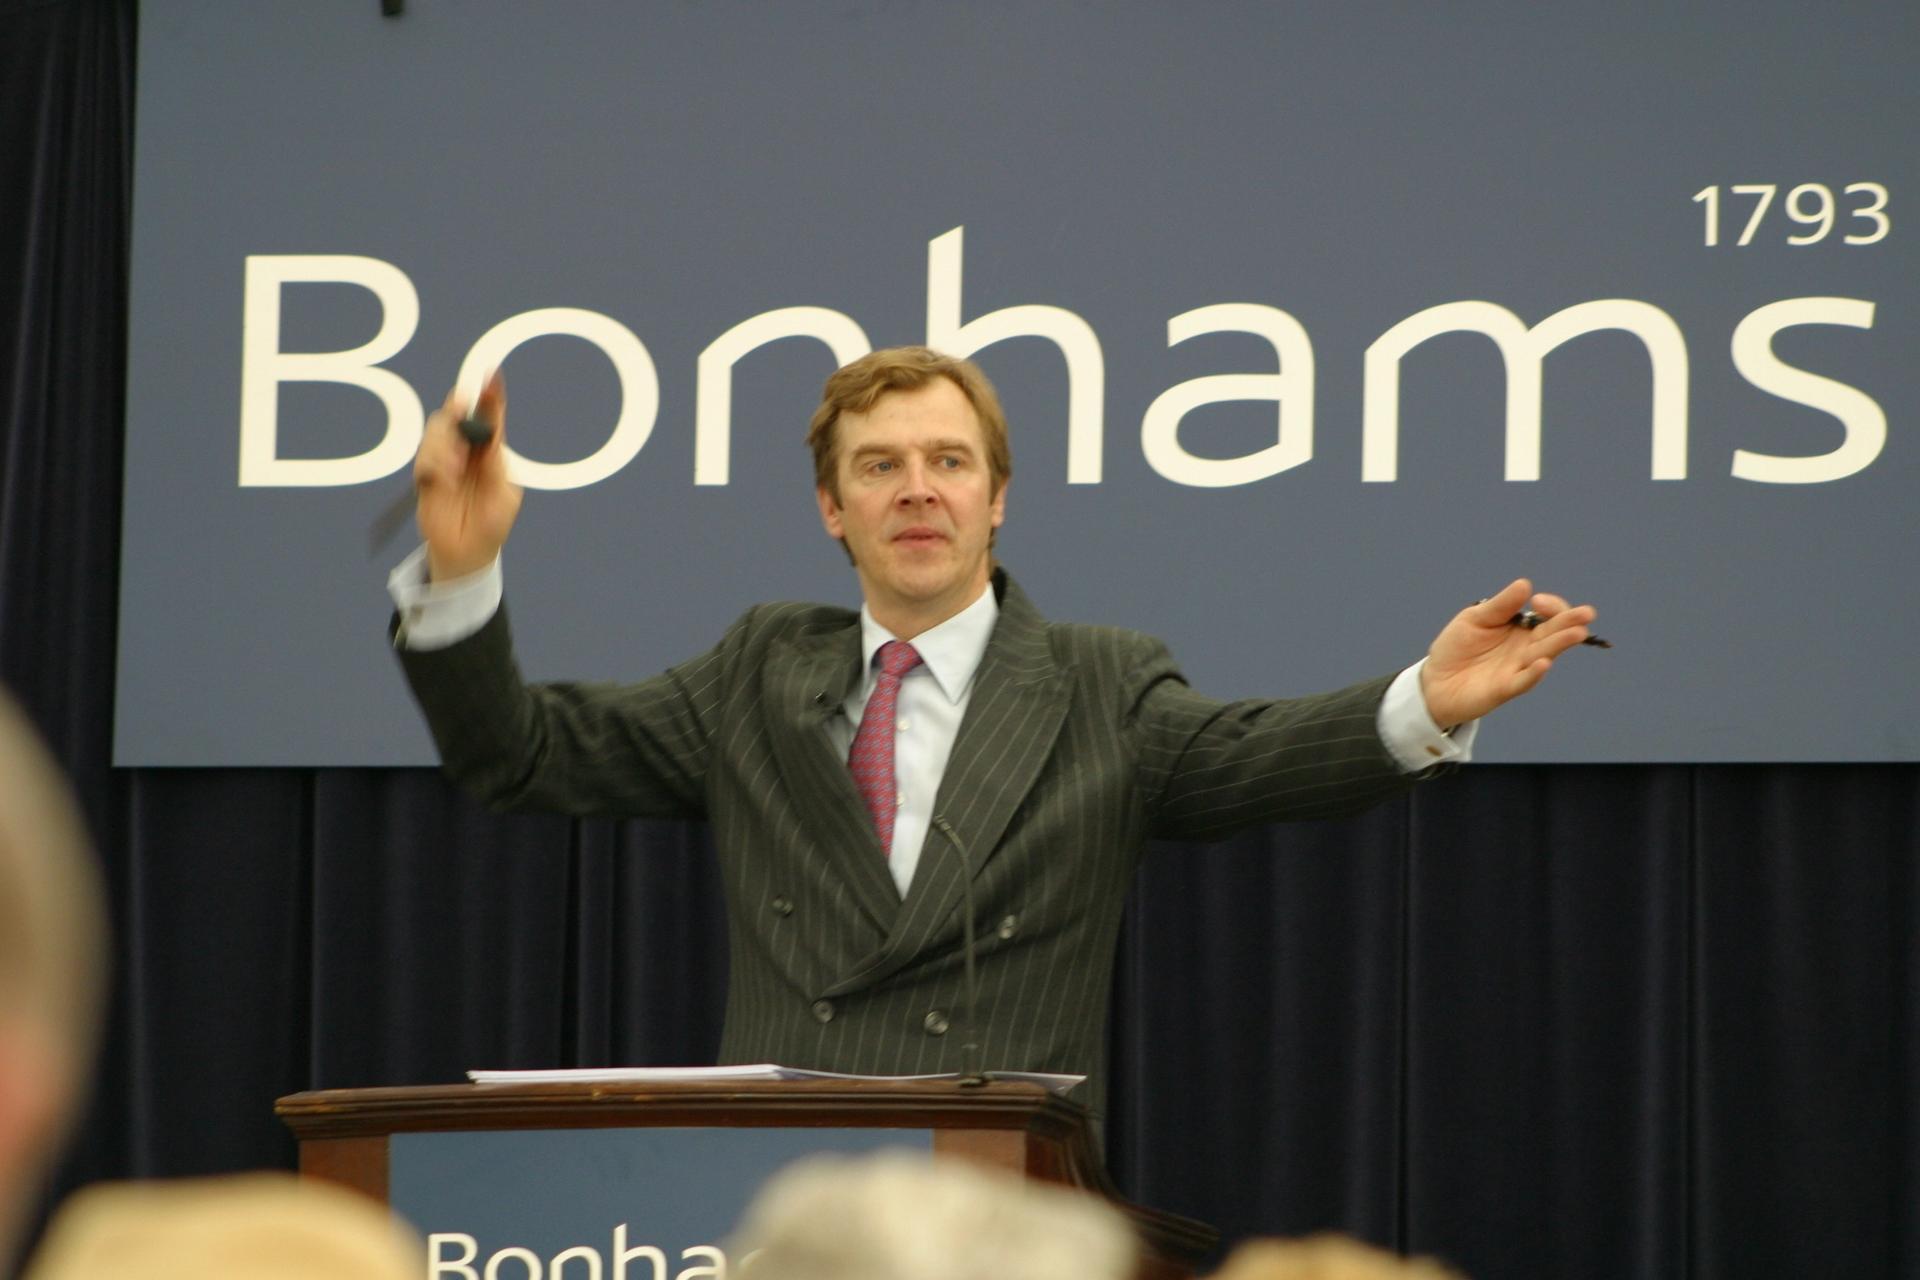 Robert Brooks on the rostrum Courtesy of Bonhams